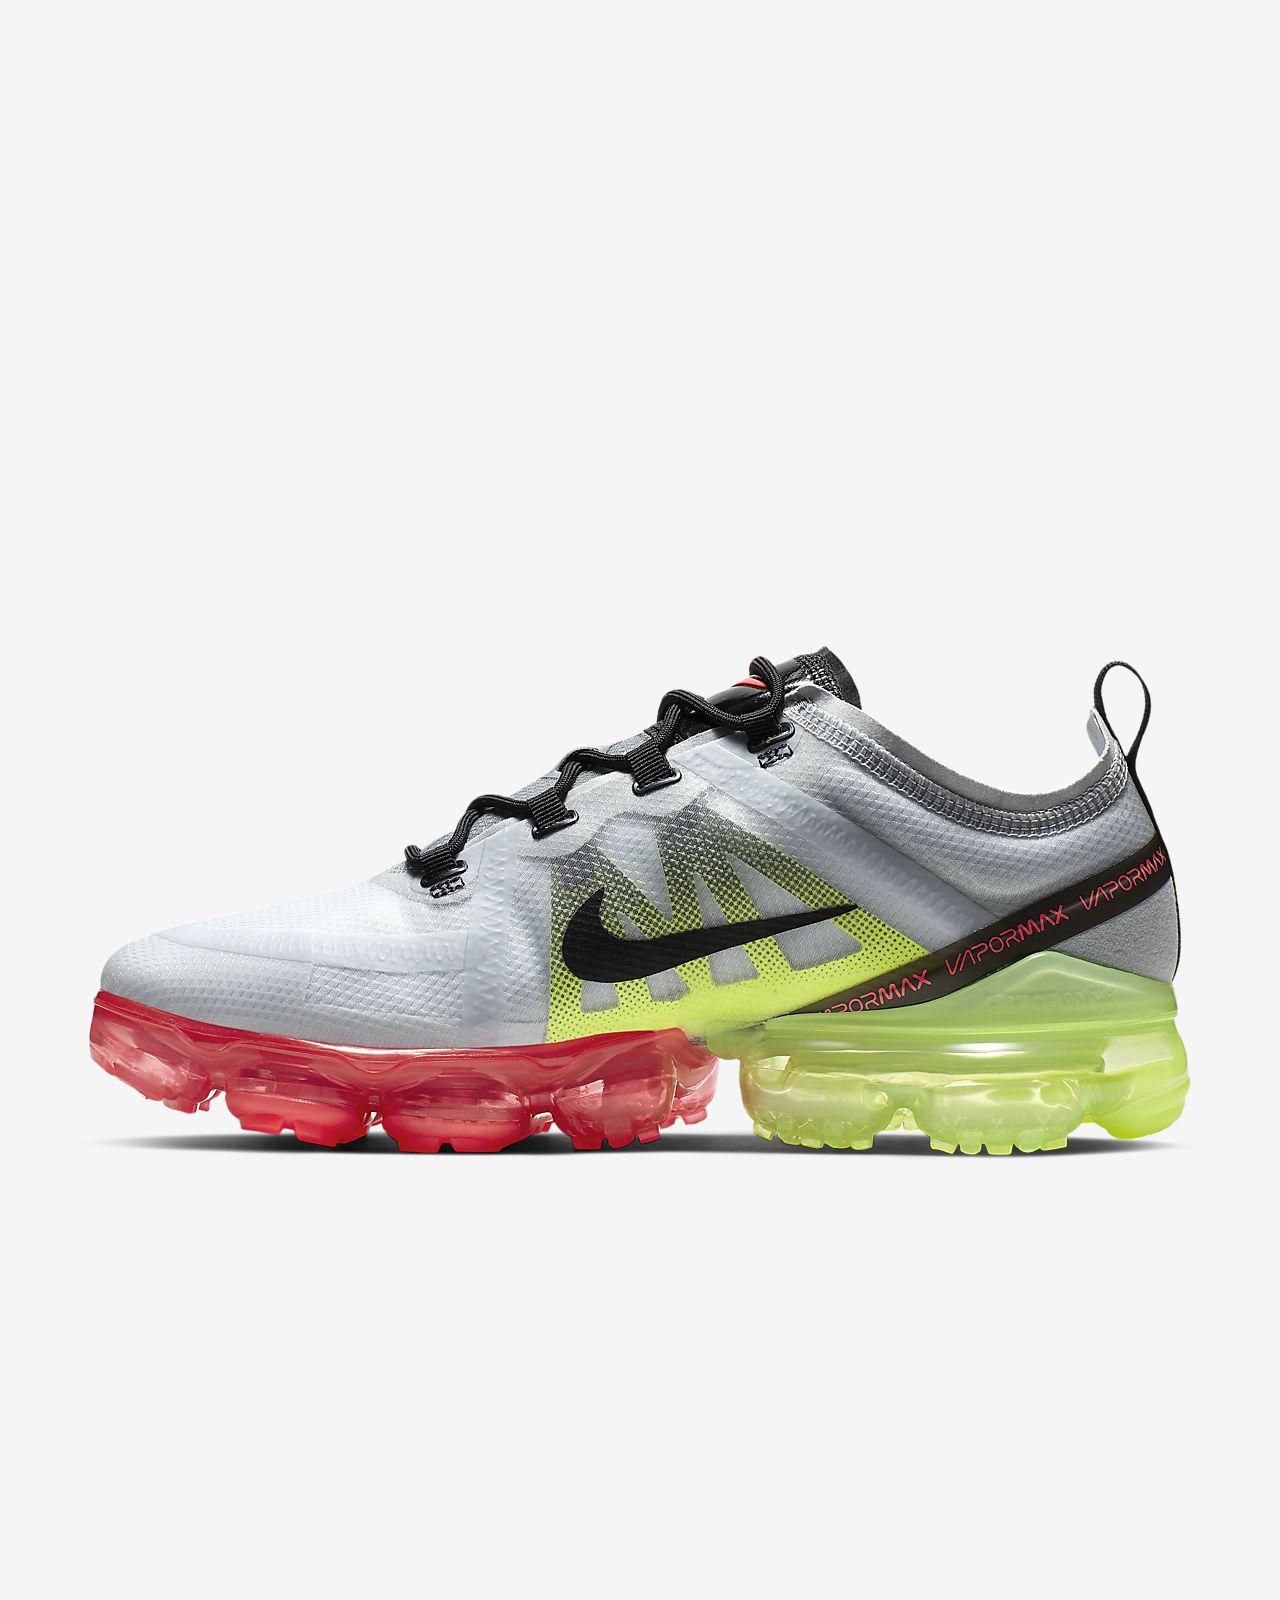 5ae8daa40bcfe Nike Air VaporMax 2019 Shoe. Nike.com GB